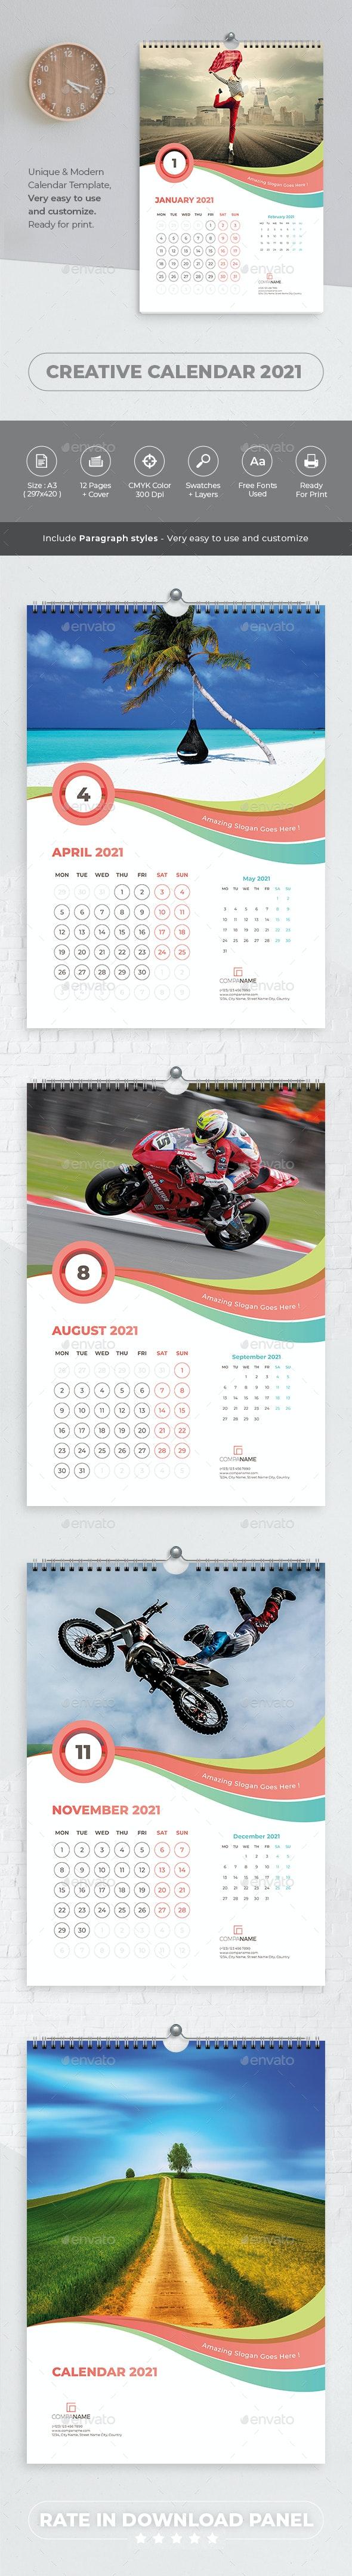 Creative Calendar 2021 - Calendars Stationery